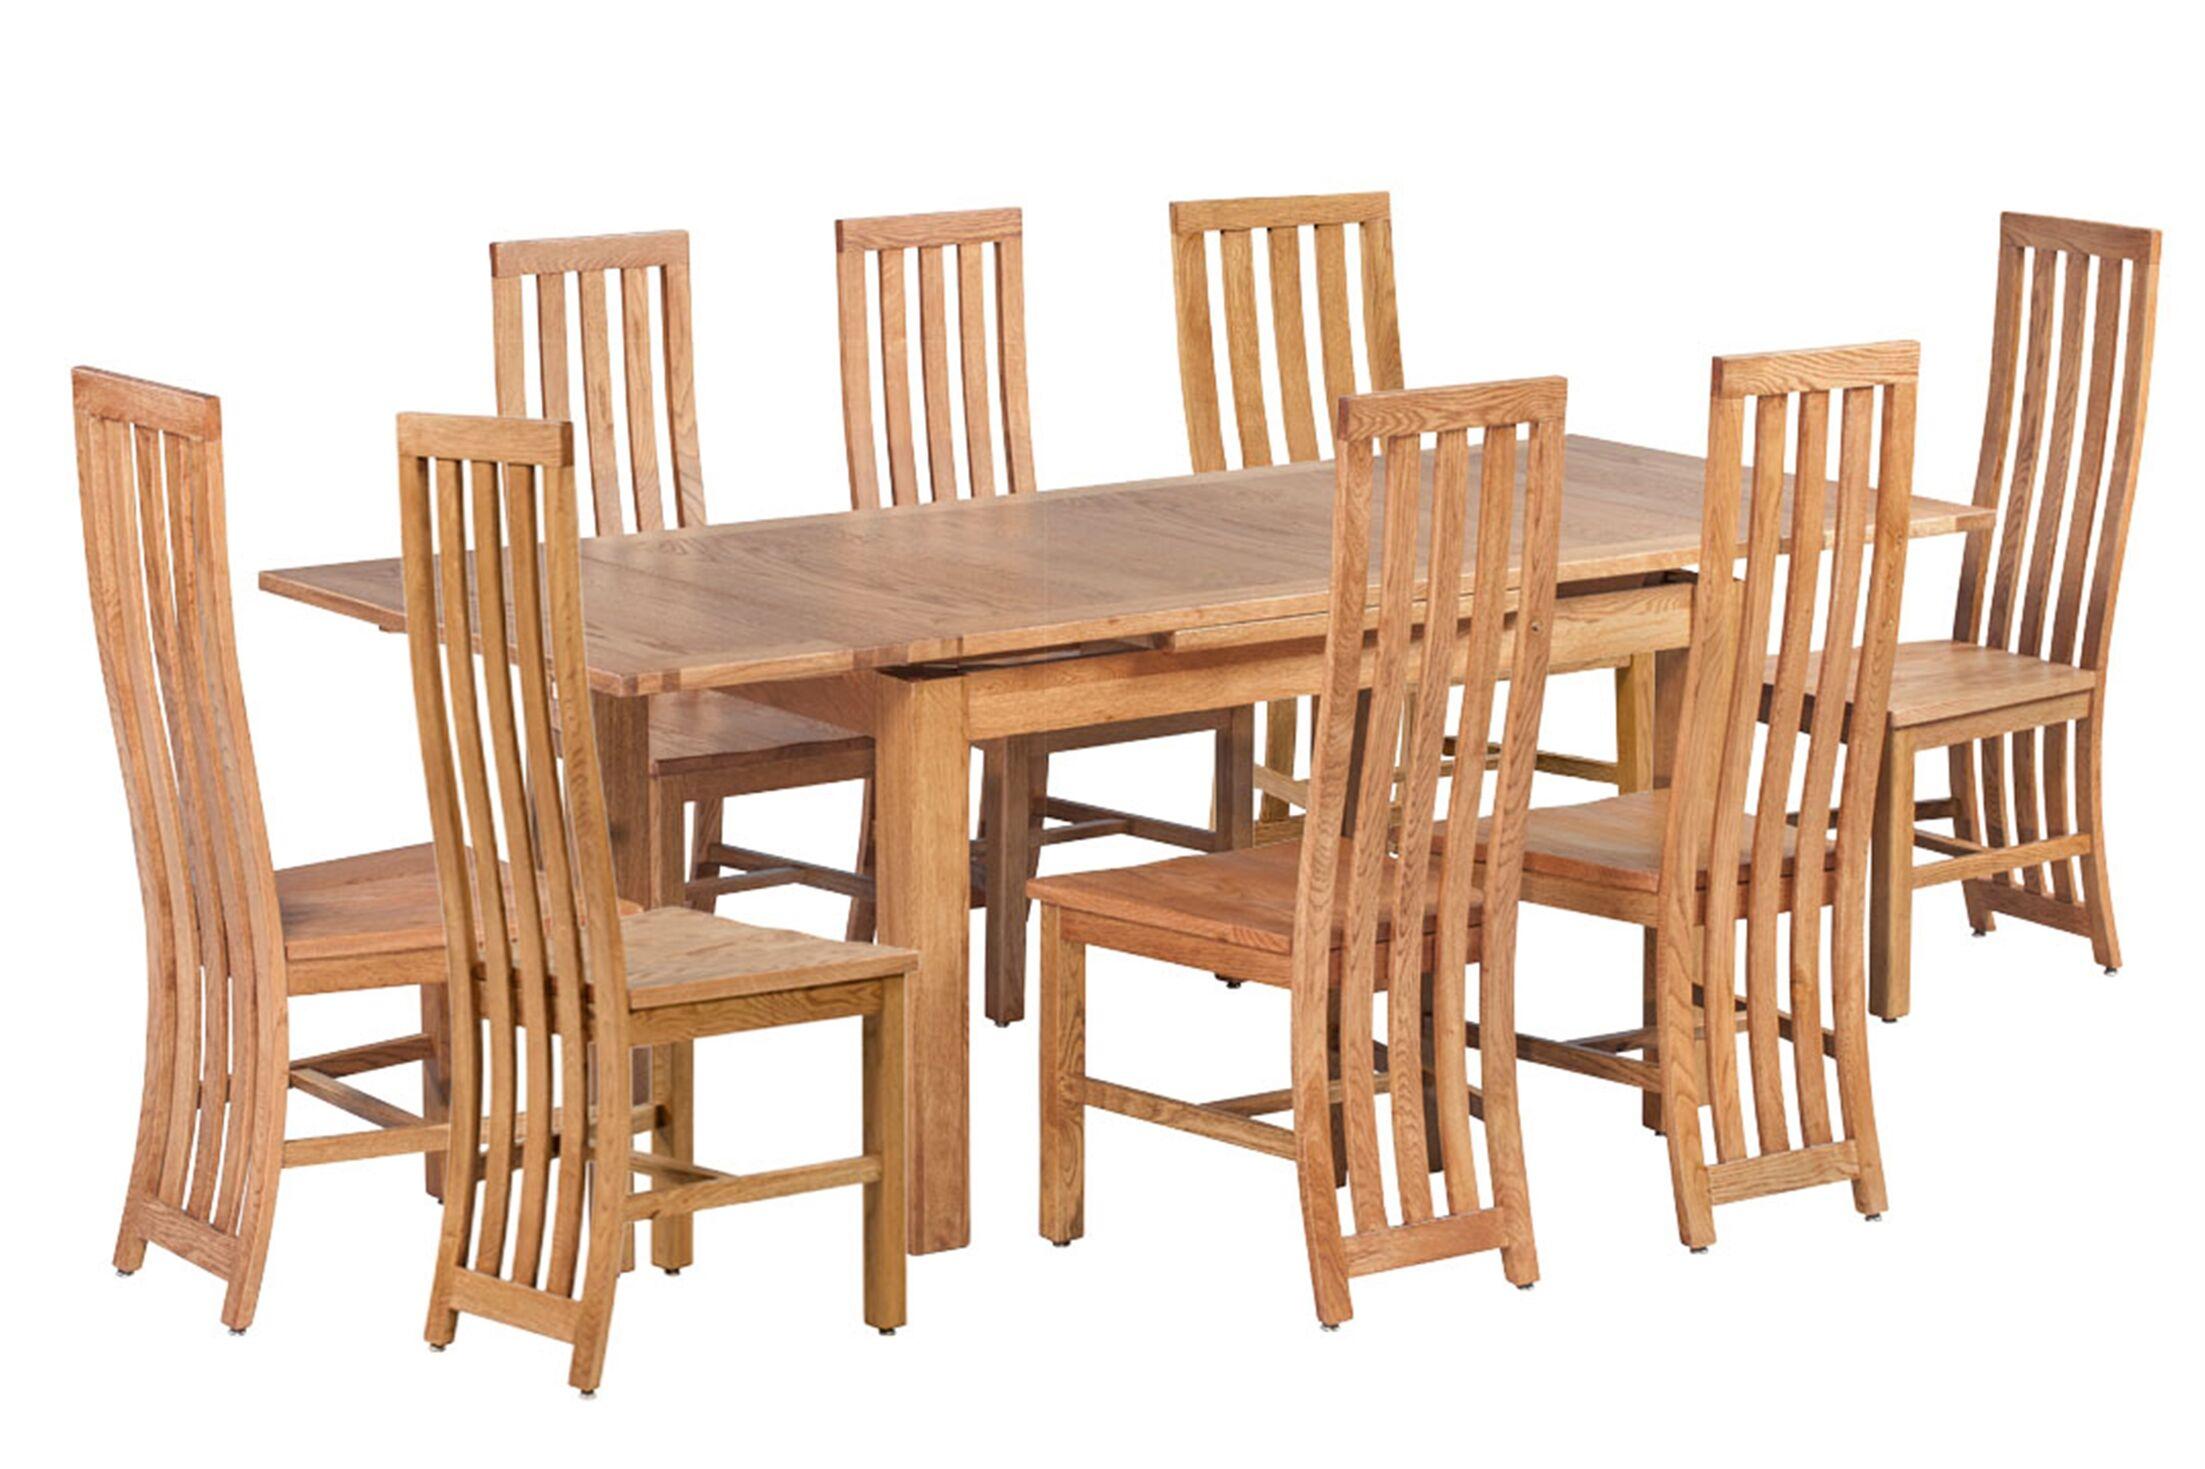 Arreola 9 Piece Extendable Solid Wood Dining Set Color: Light Dark Oak